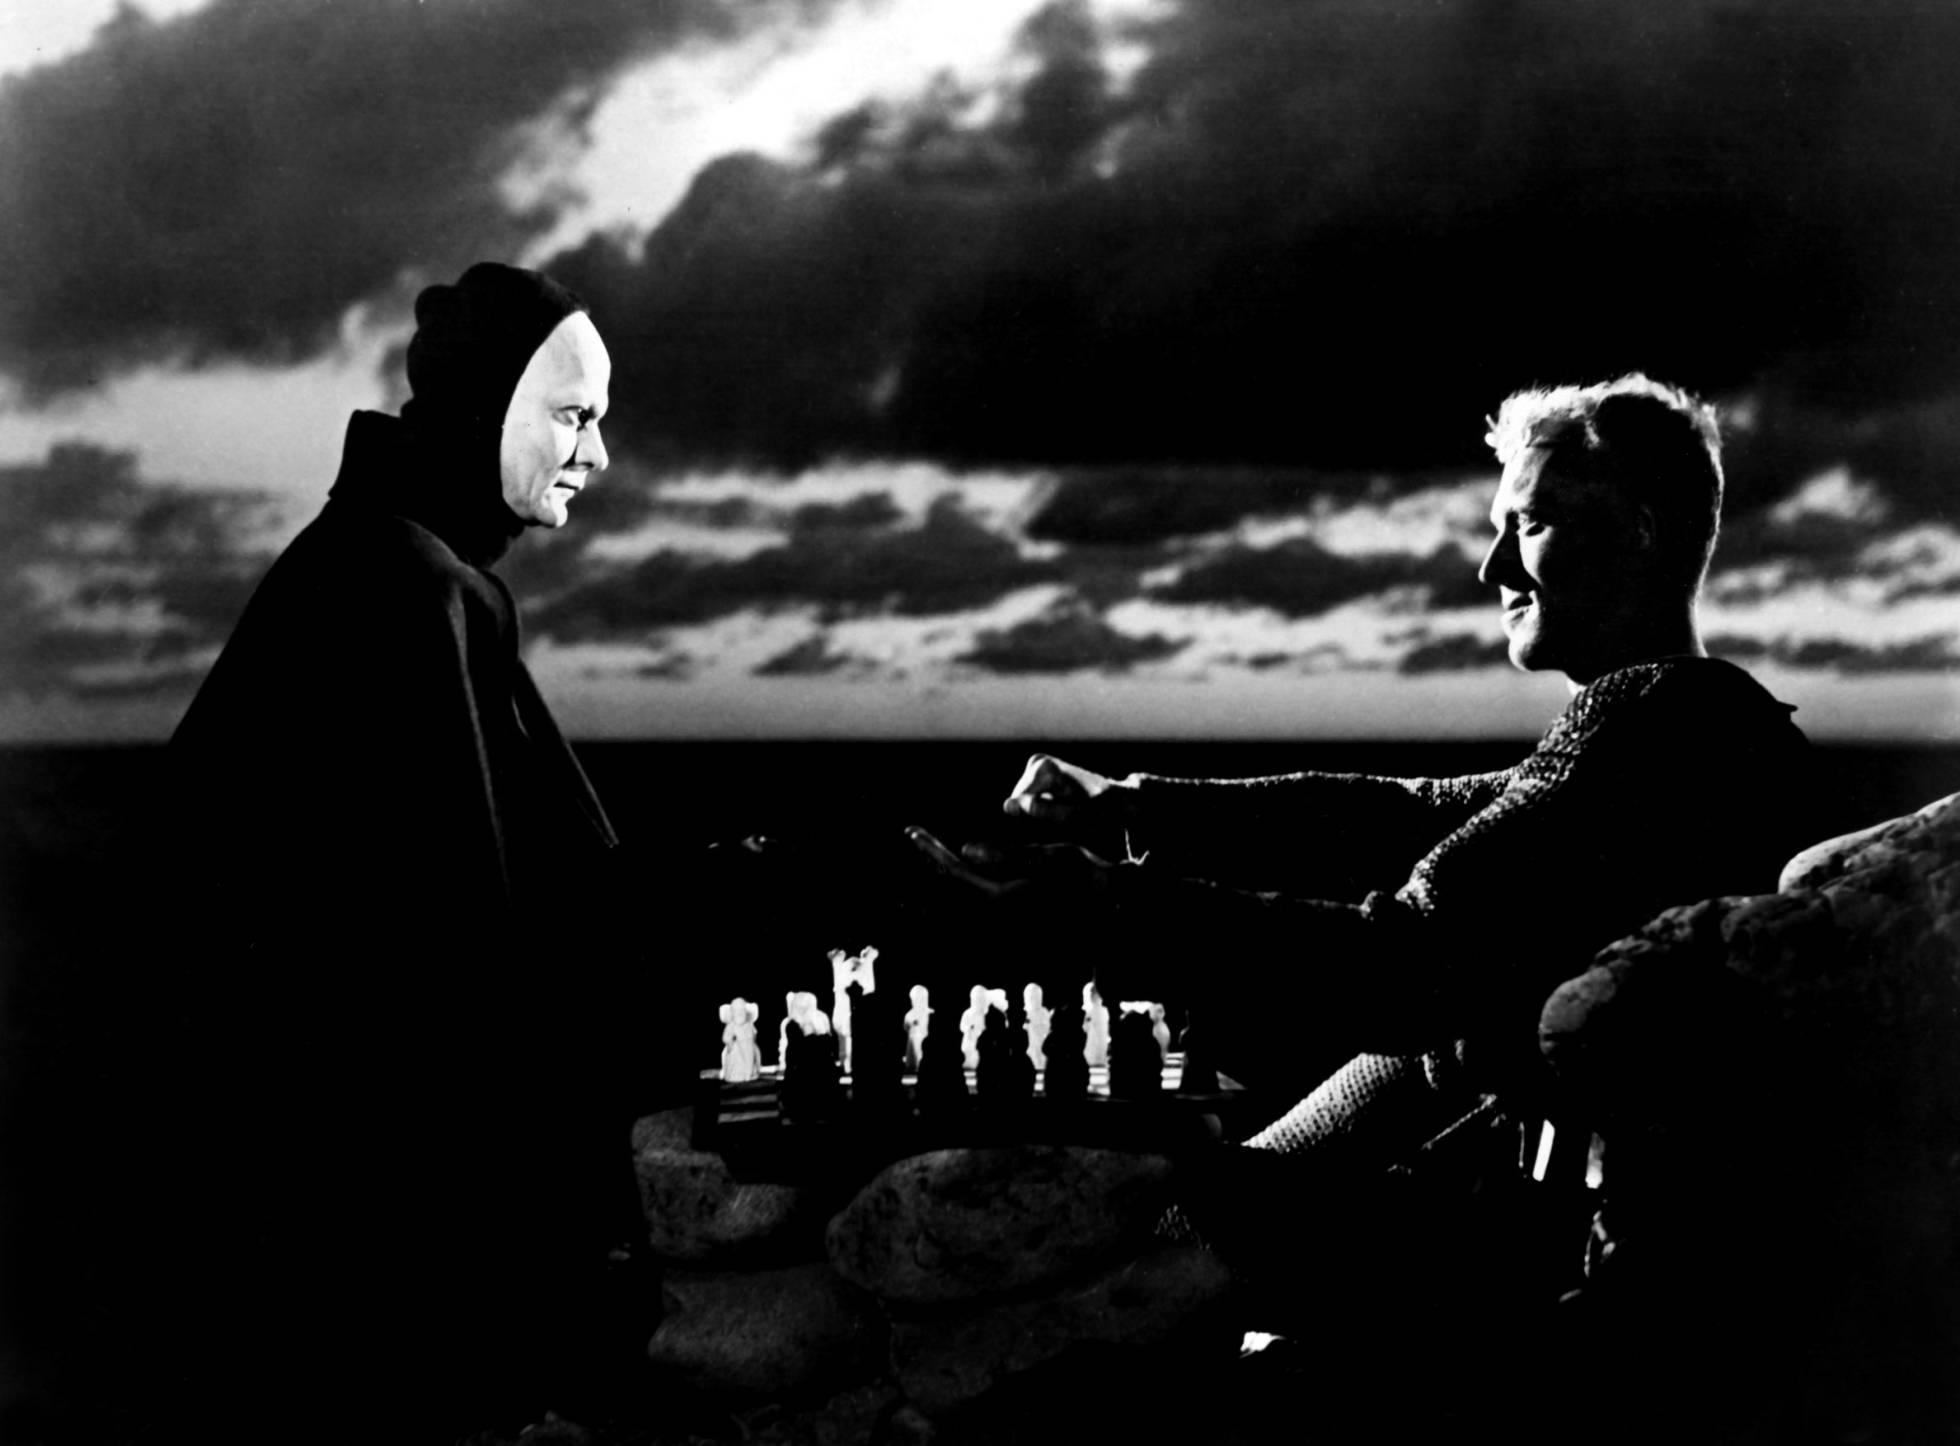 No Séptimo Seal 'Max Von Sydow estaba a buscar un inimigo realmente difícil de bater: a mesma morte.'El séptimo sello' Max Von Sydow se buscaba un enemigo realmente difícil de batir: la mismísima muerte.